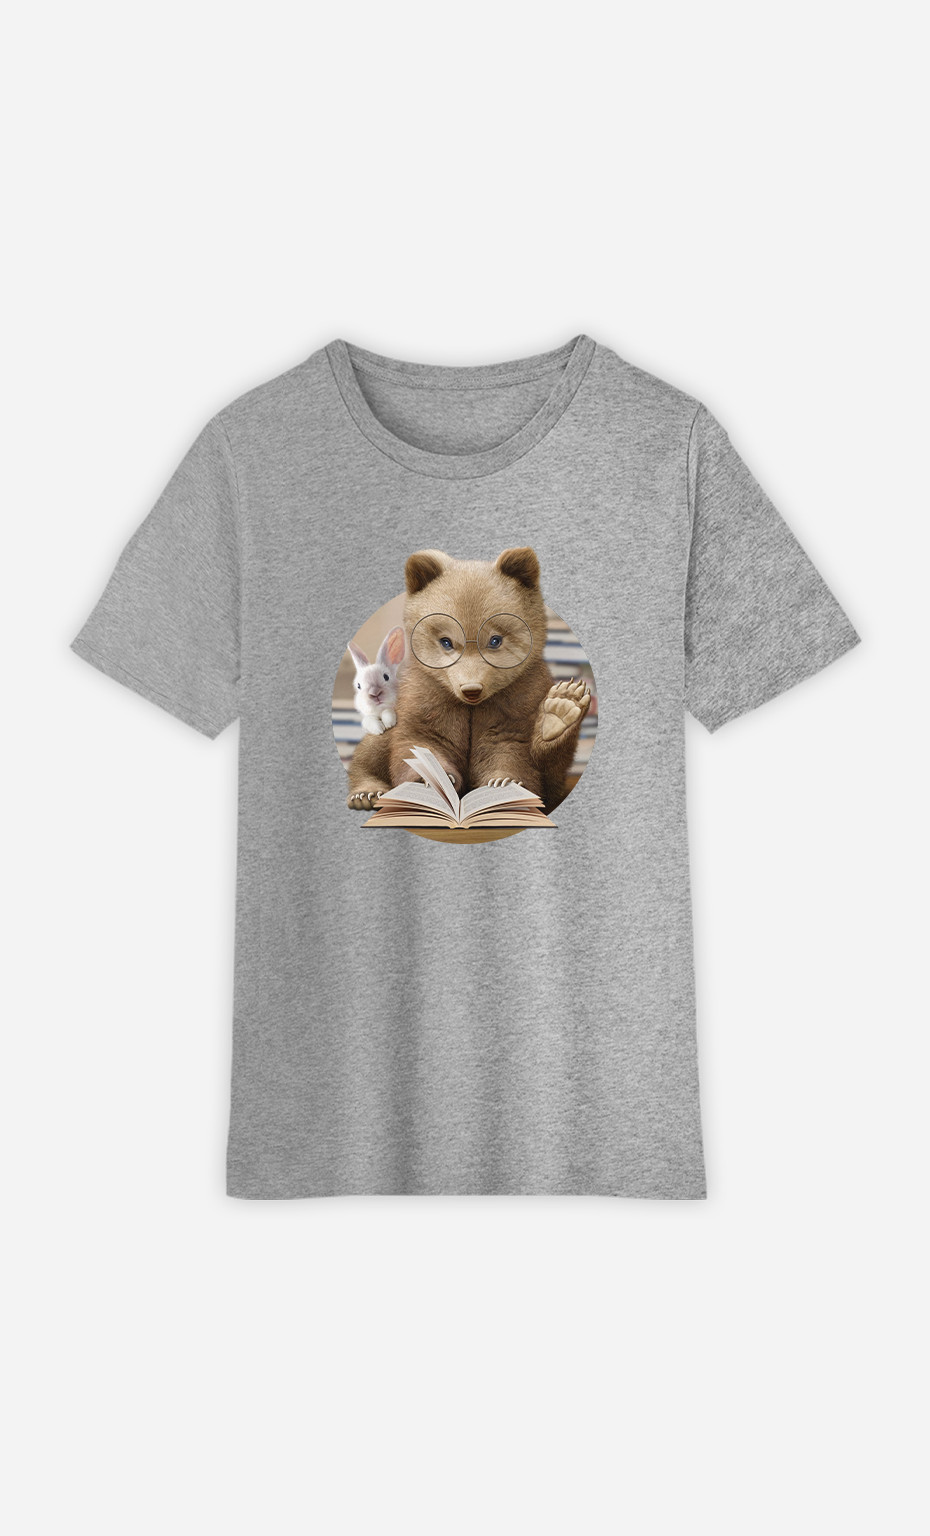 Kid T-Shirt Reading Time